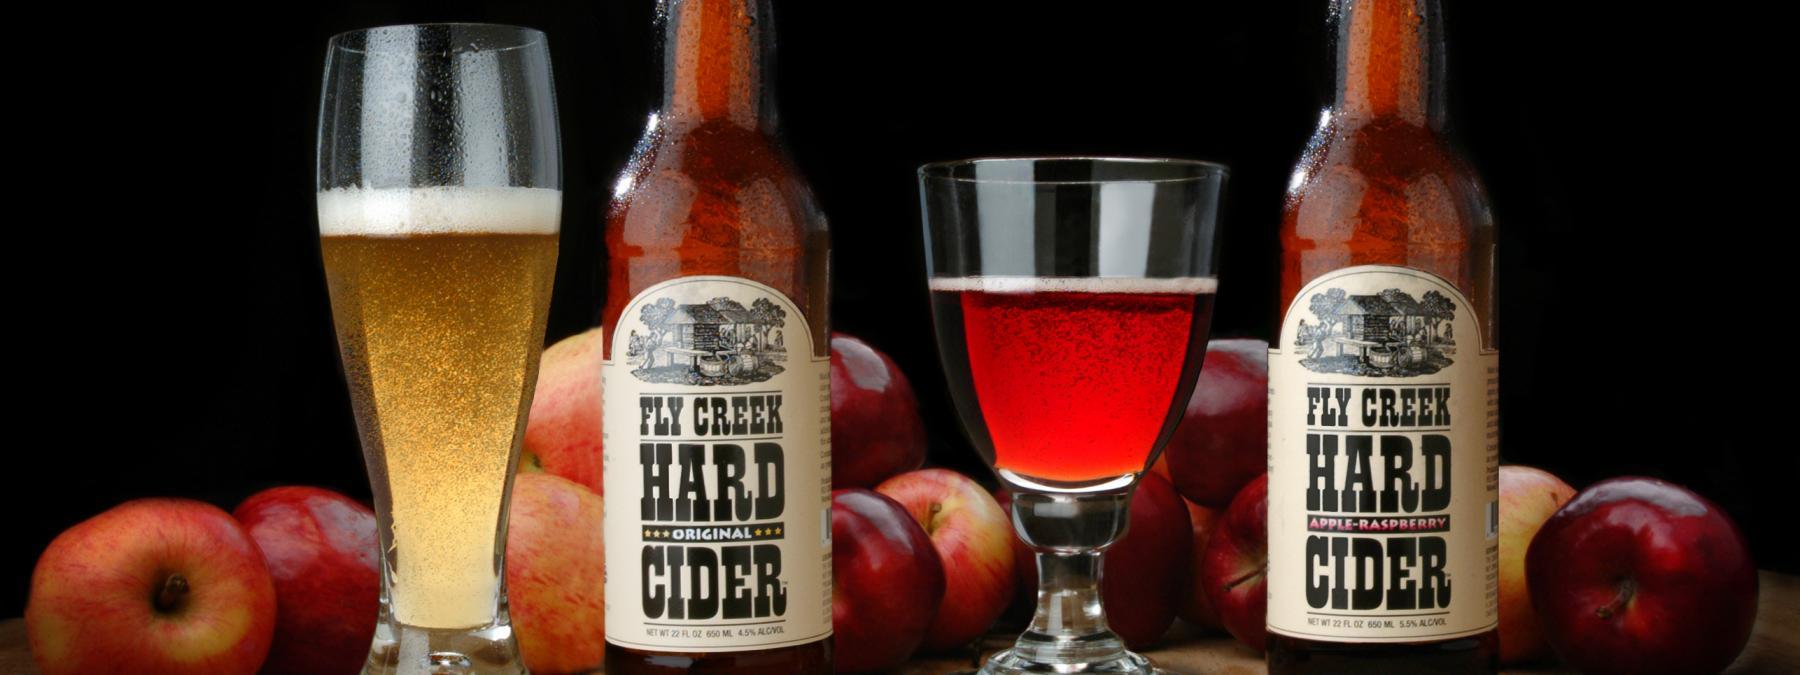 Apple Wines and Hard Ciders